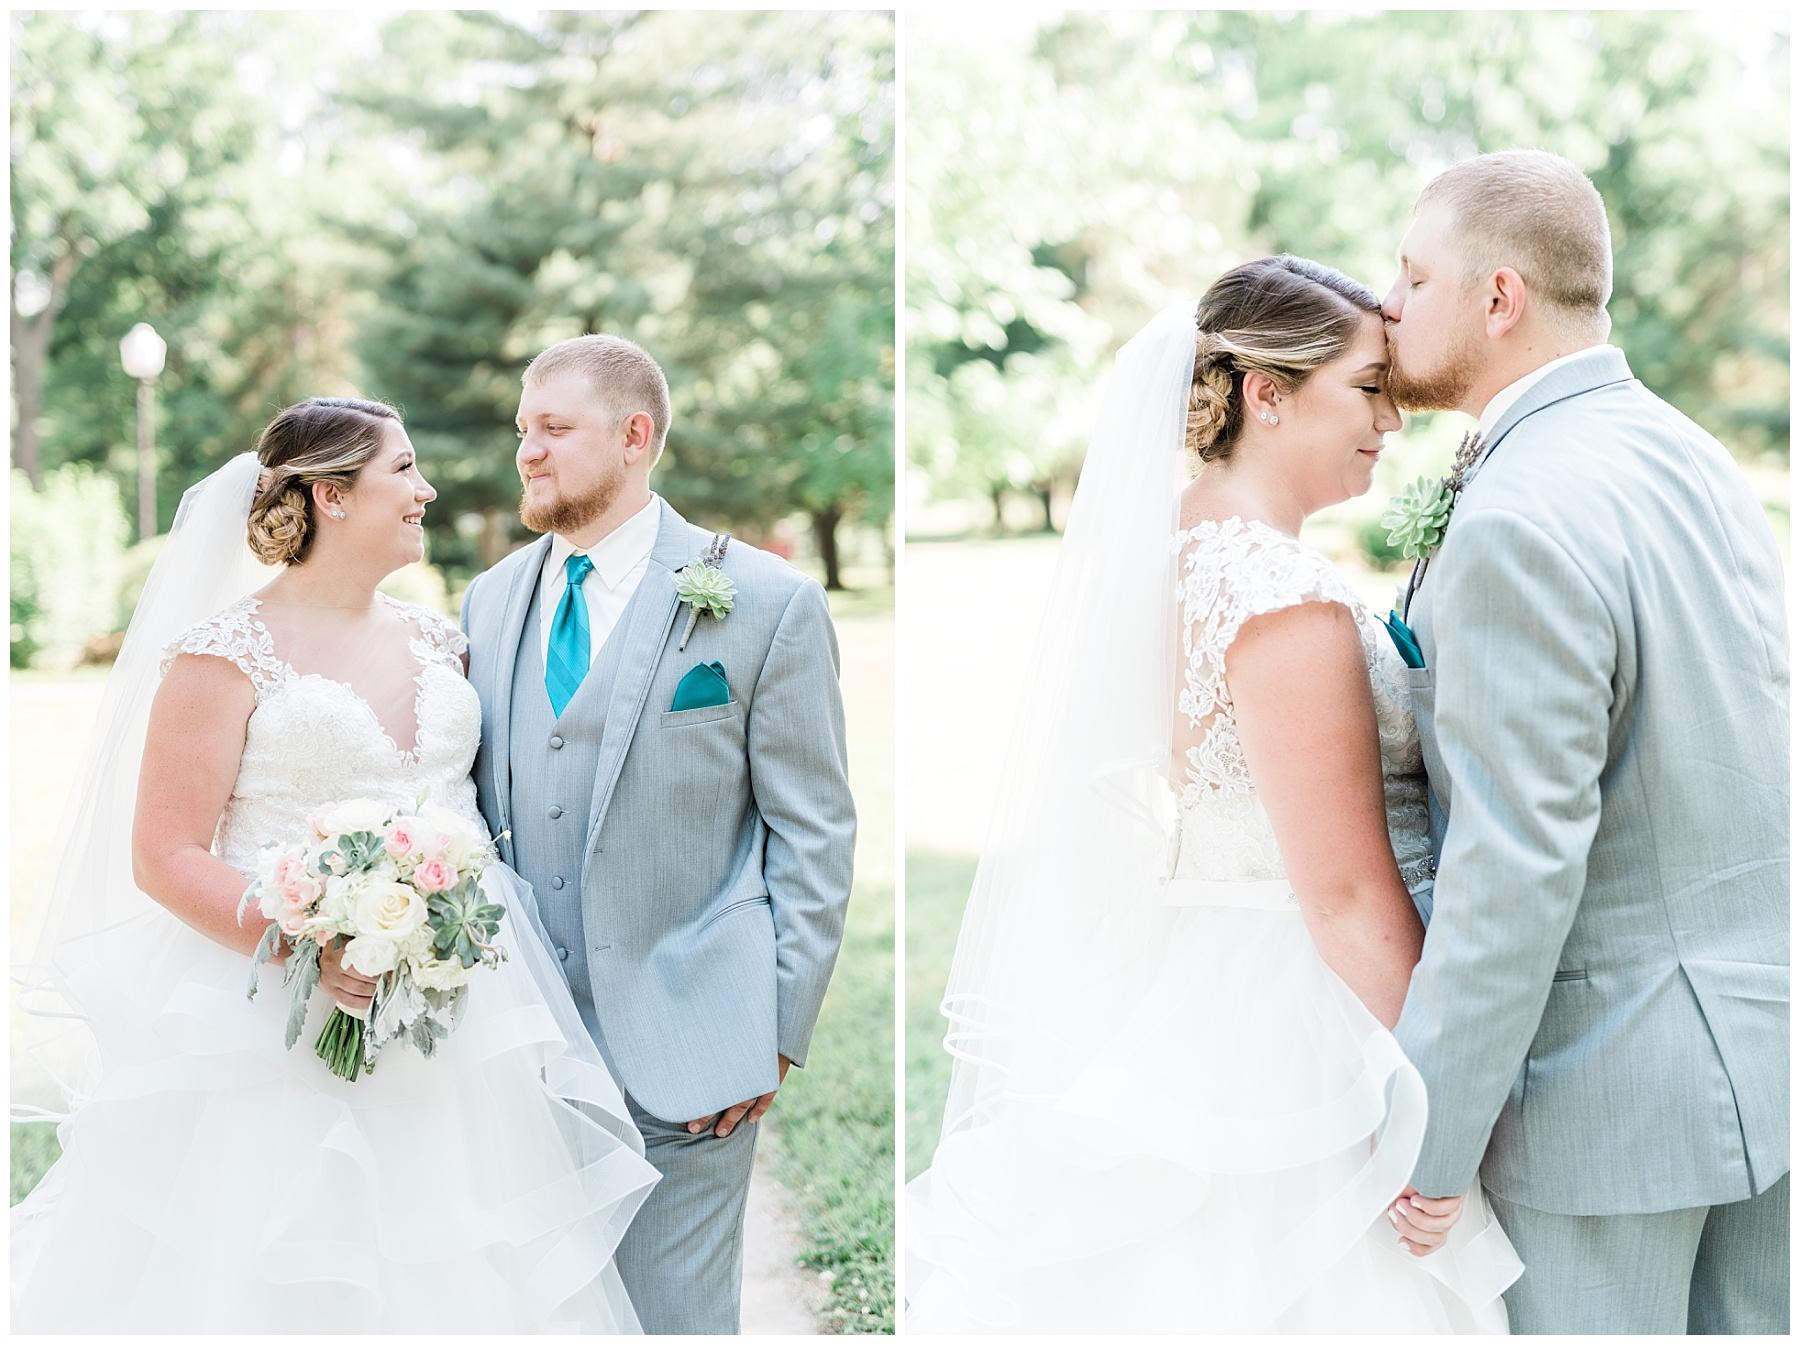 Baurichter Wedding at Stoney Creek Inn Columbia Missouri by Kelsi Kliethermes Photography_0017.jpg